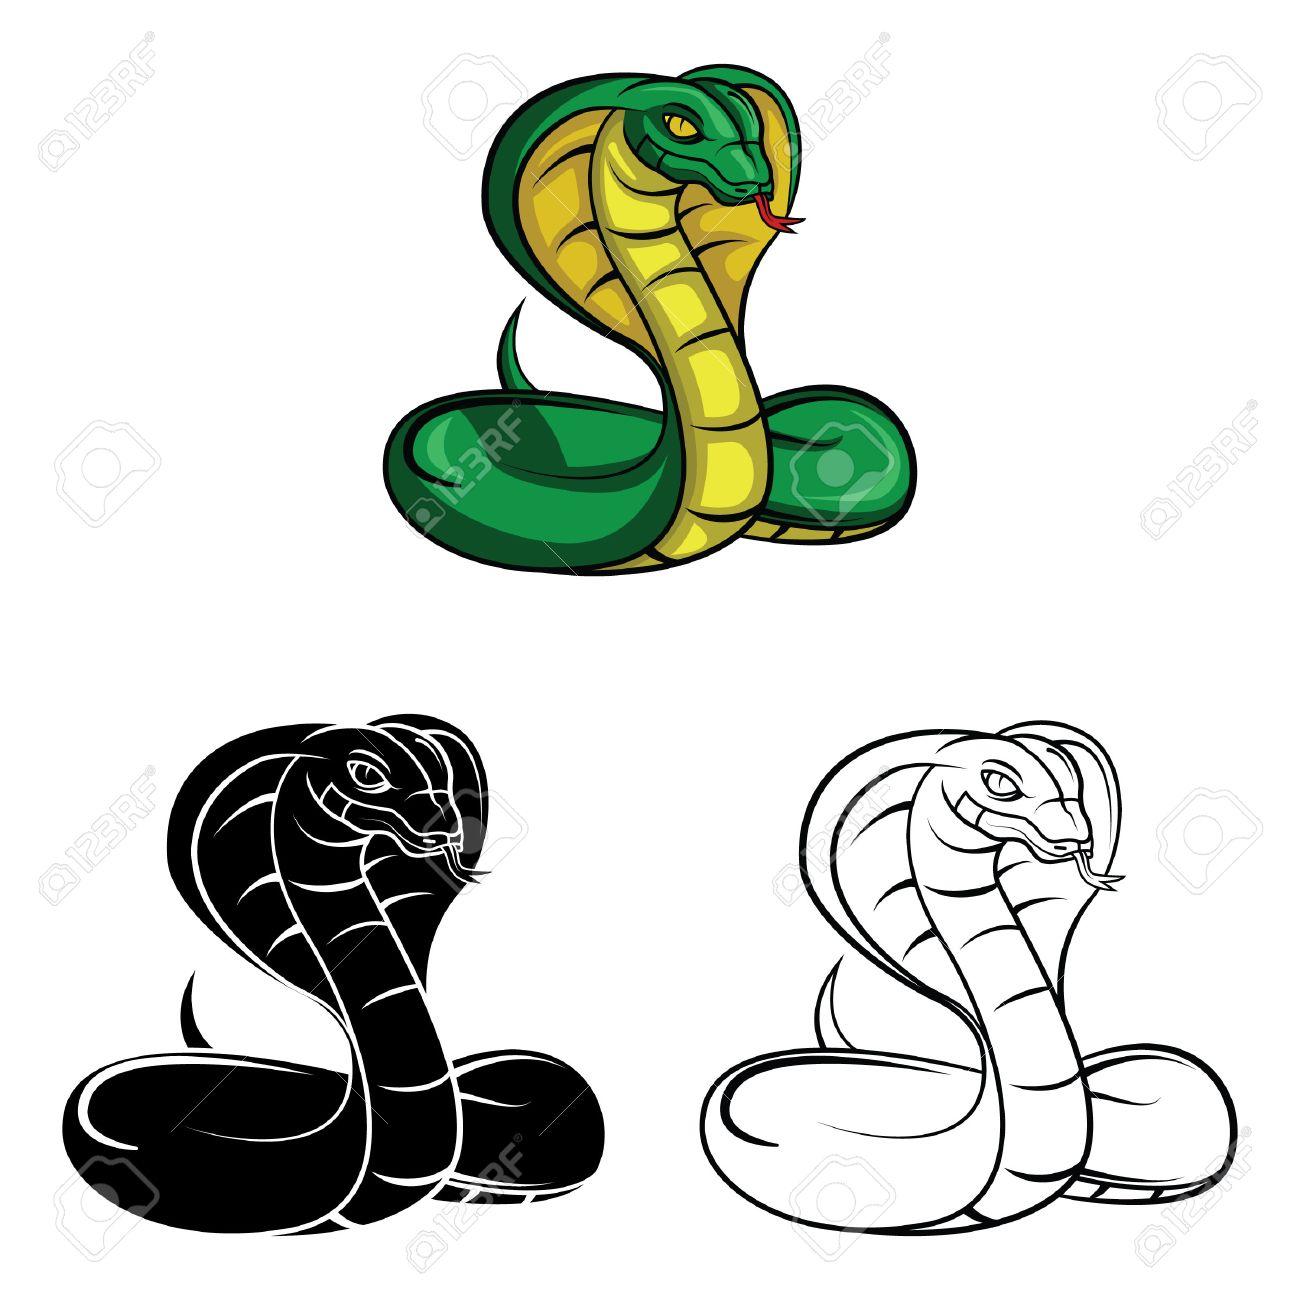 Dessin Cobra personnage de dessin animé livre de cobra coloriage - illustration